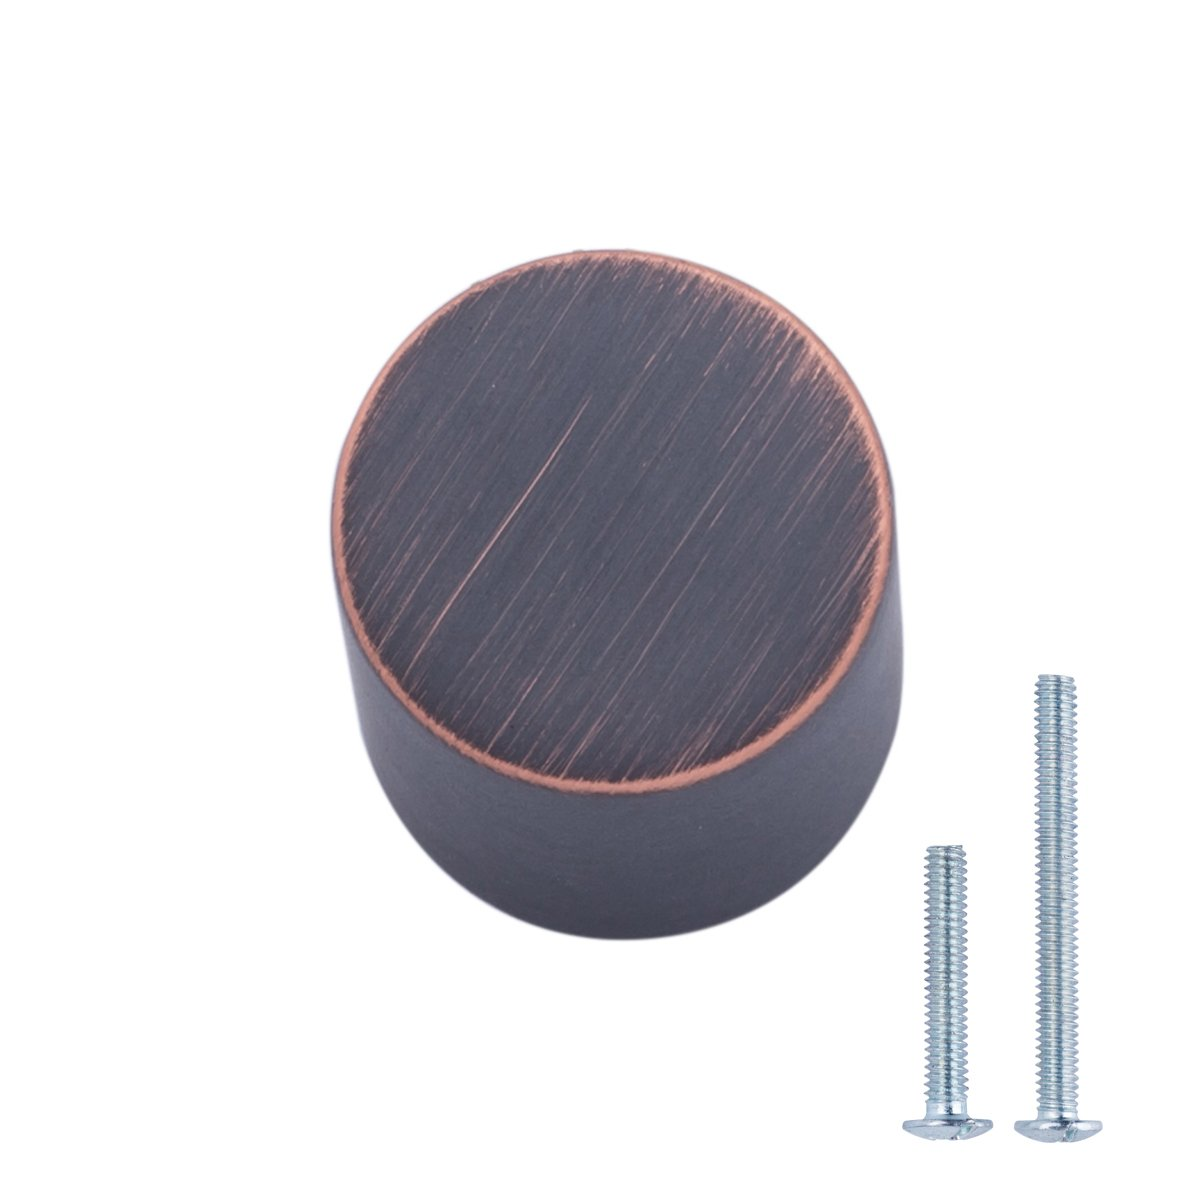 AmazonBasics Whistle Cabinet Knob, 0.75'' Diameter, Oil Rubbed Bronze, 25-Pack by AmazonBasics (Image #1)